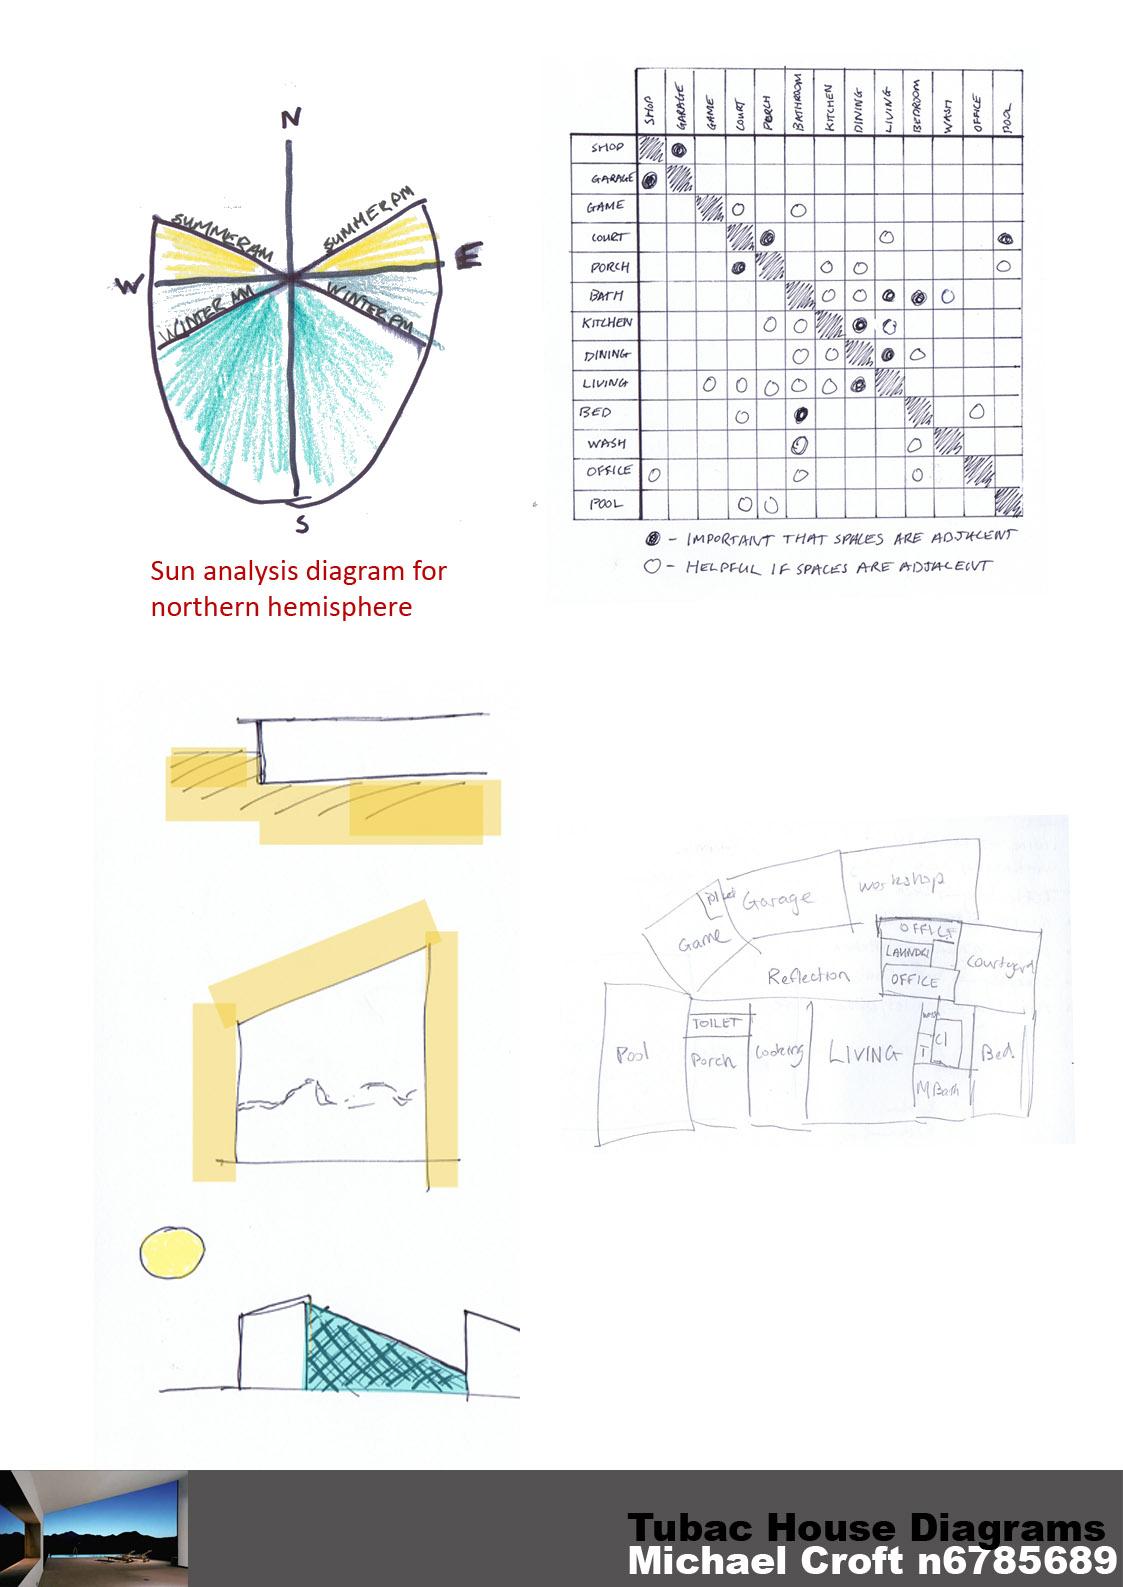 DAB310 - Michael Croft Project 1: Tubac House - Part B